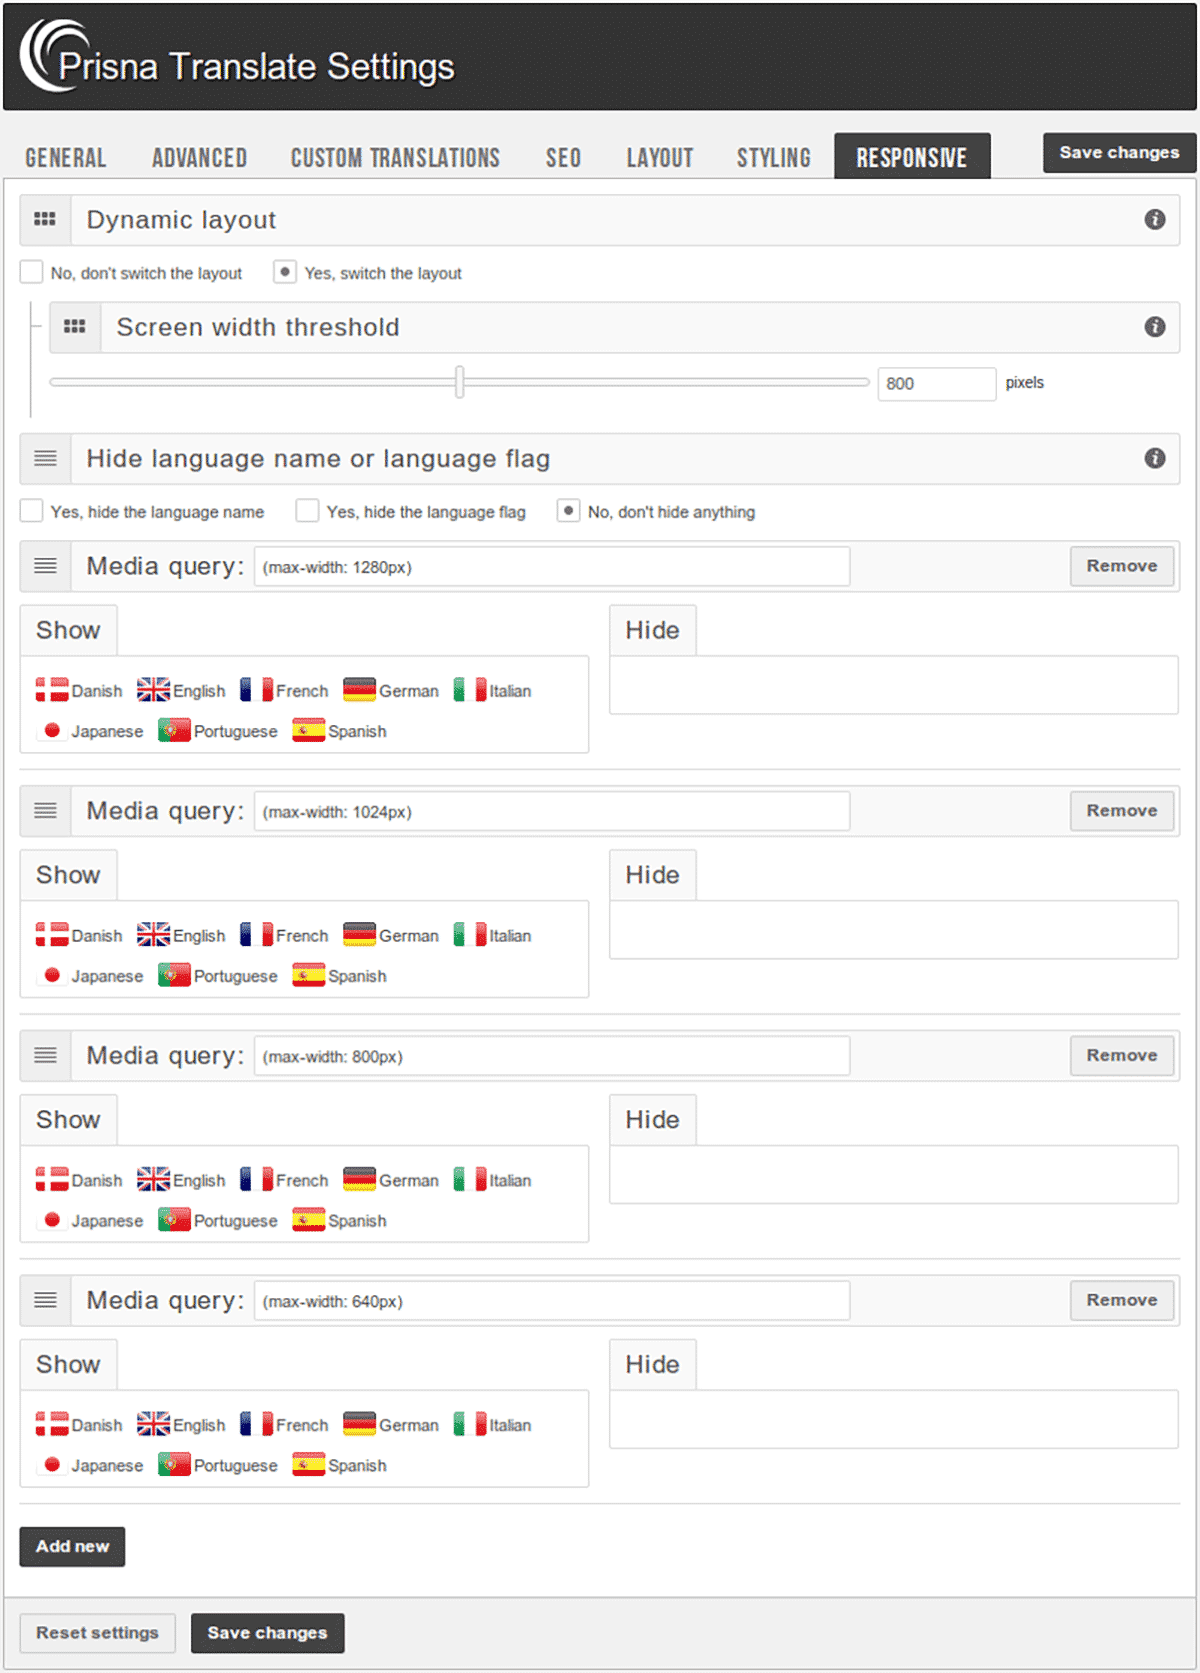 Responsive Settings in Google Website Translator